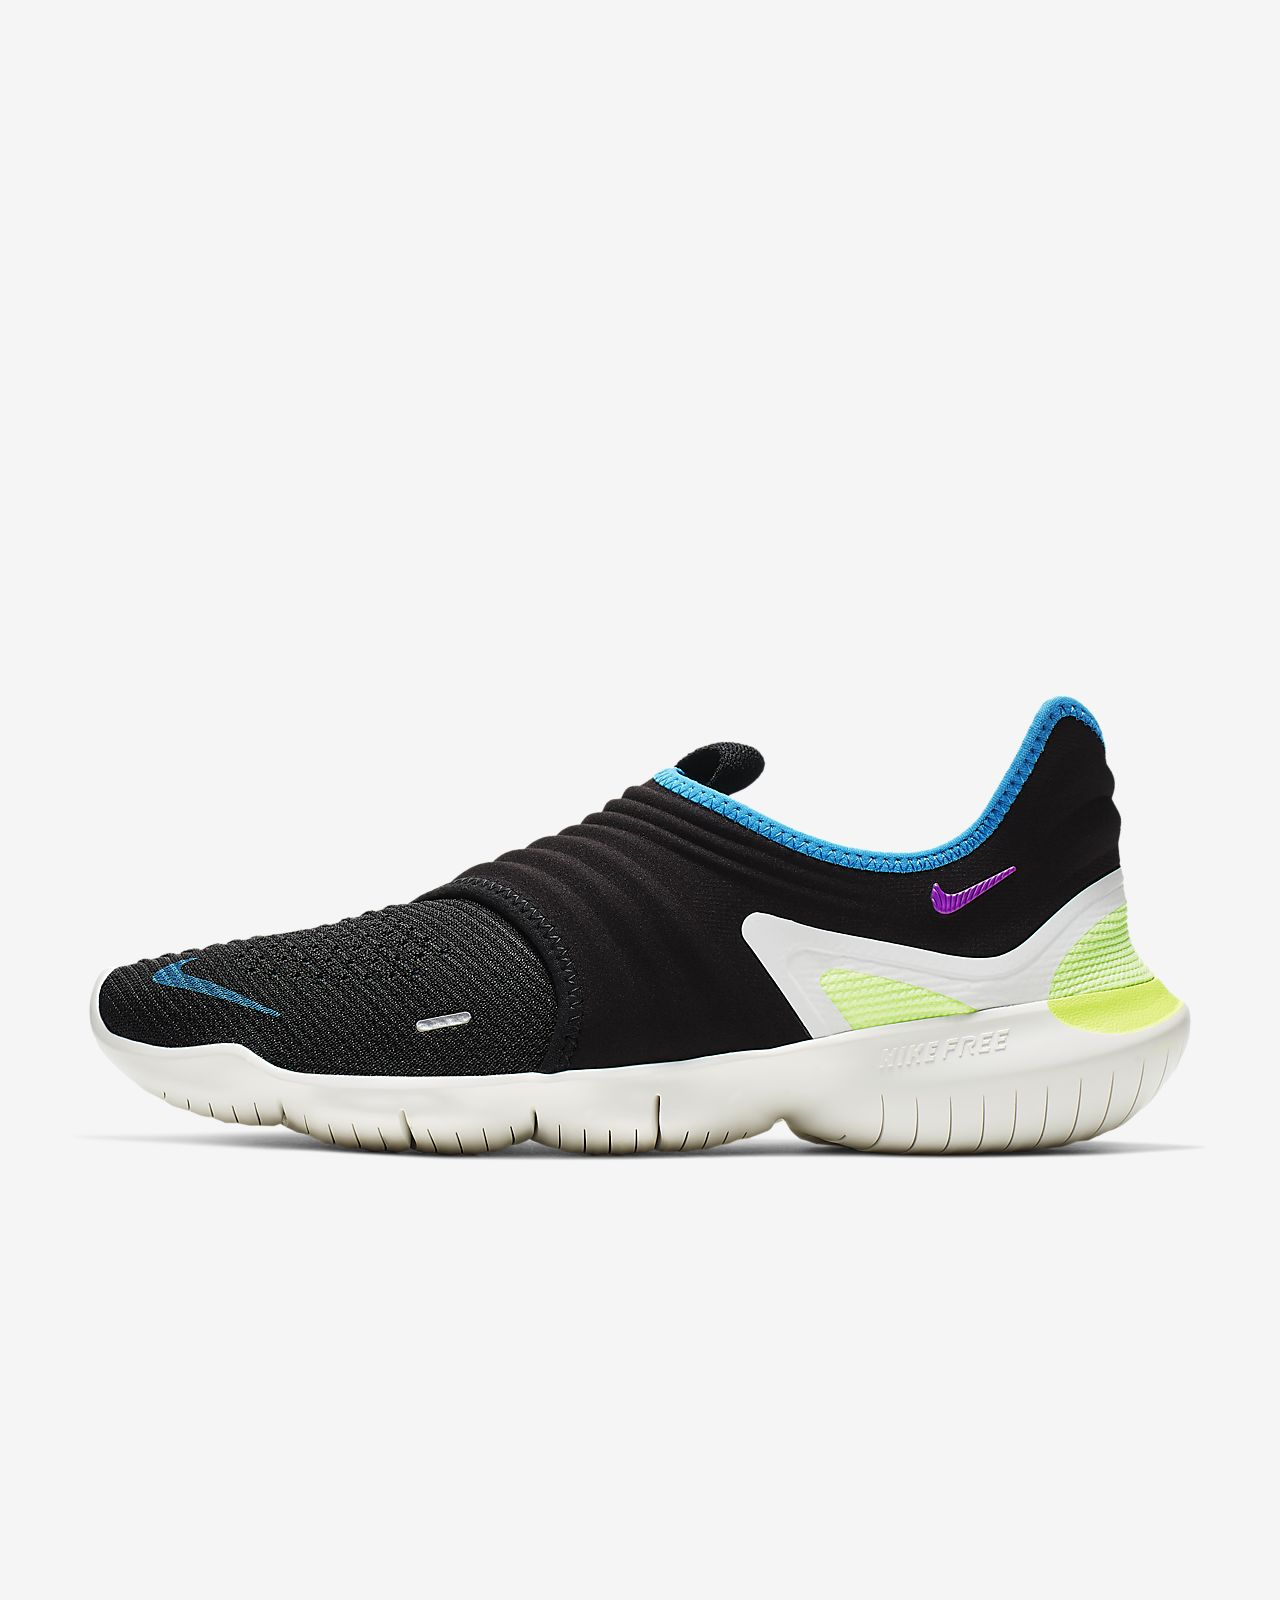 81cdf27ef7a Nike Free RN Flyknit 3.0 Men s Running Shoe. Nike.com PT